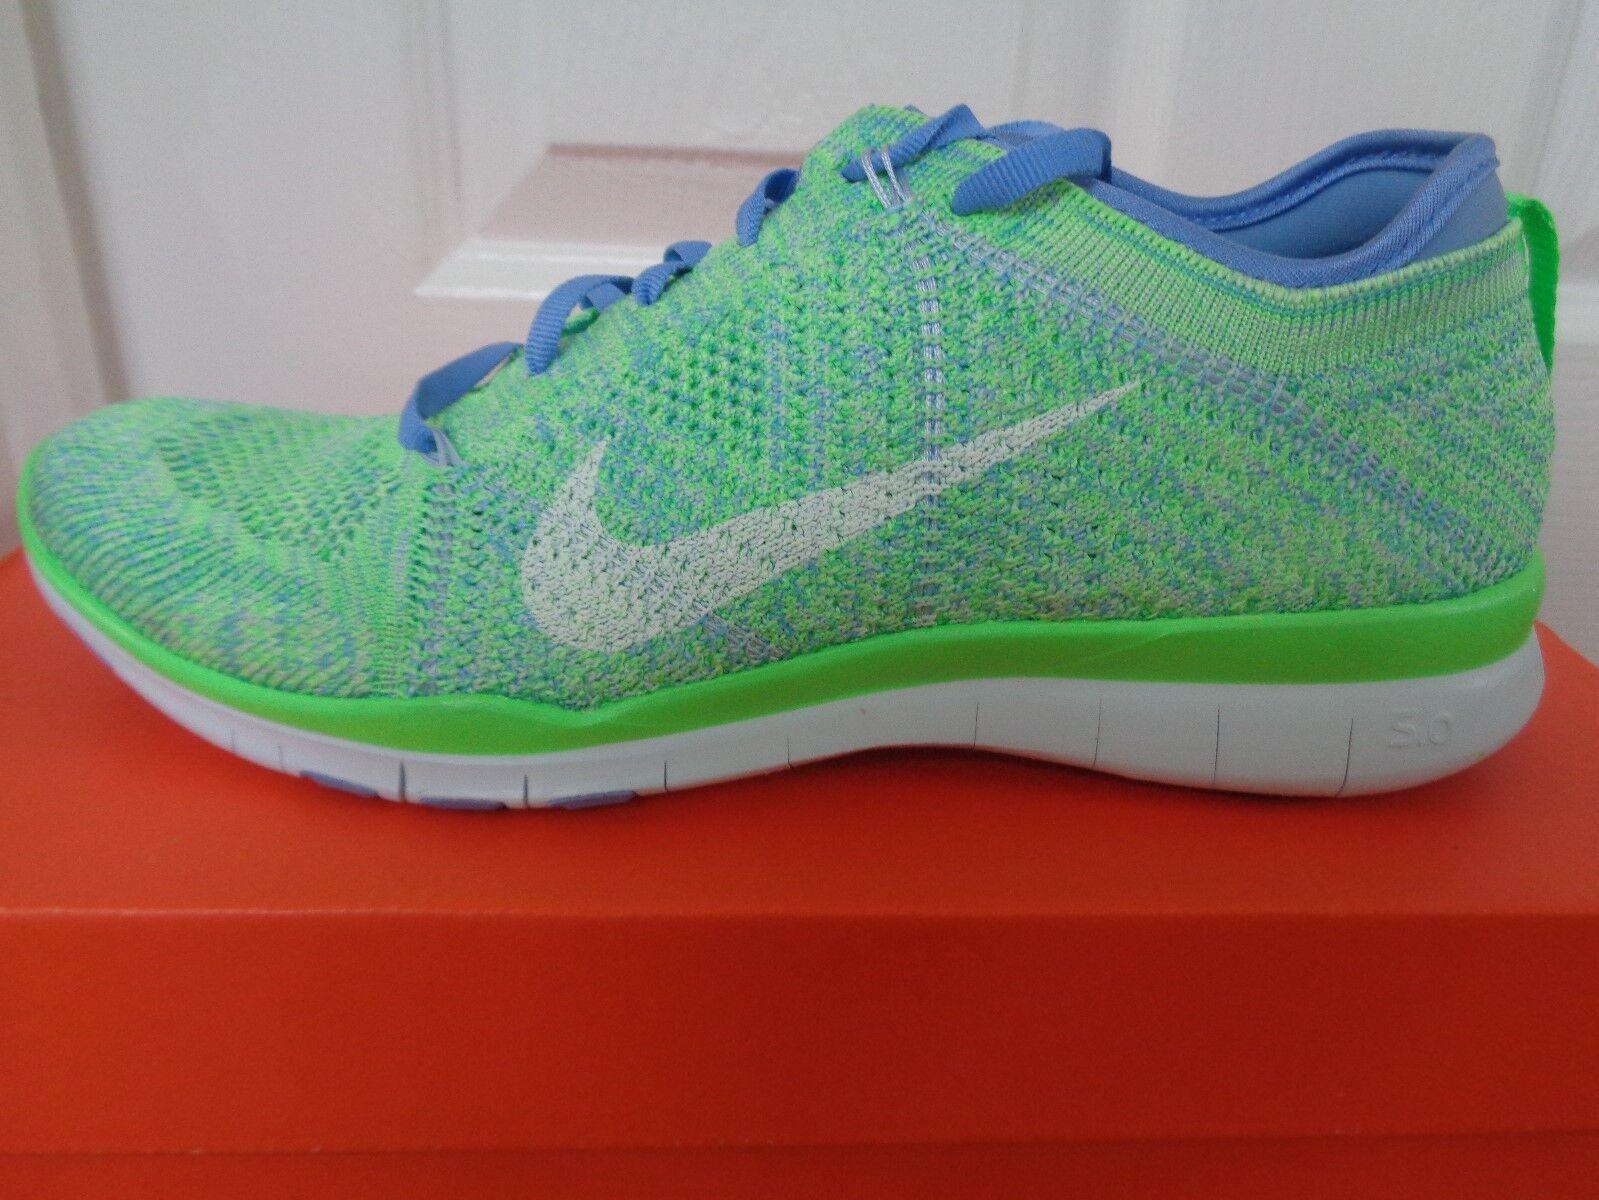 Nike Free TR Flyknit 718785 301 femmes  trainers sneakers uk 6 eu 40 us 8.5 NEW+BOX